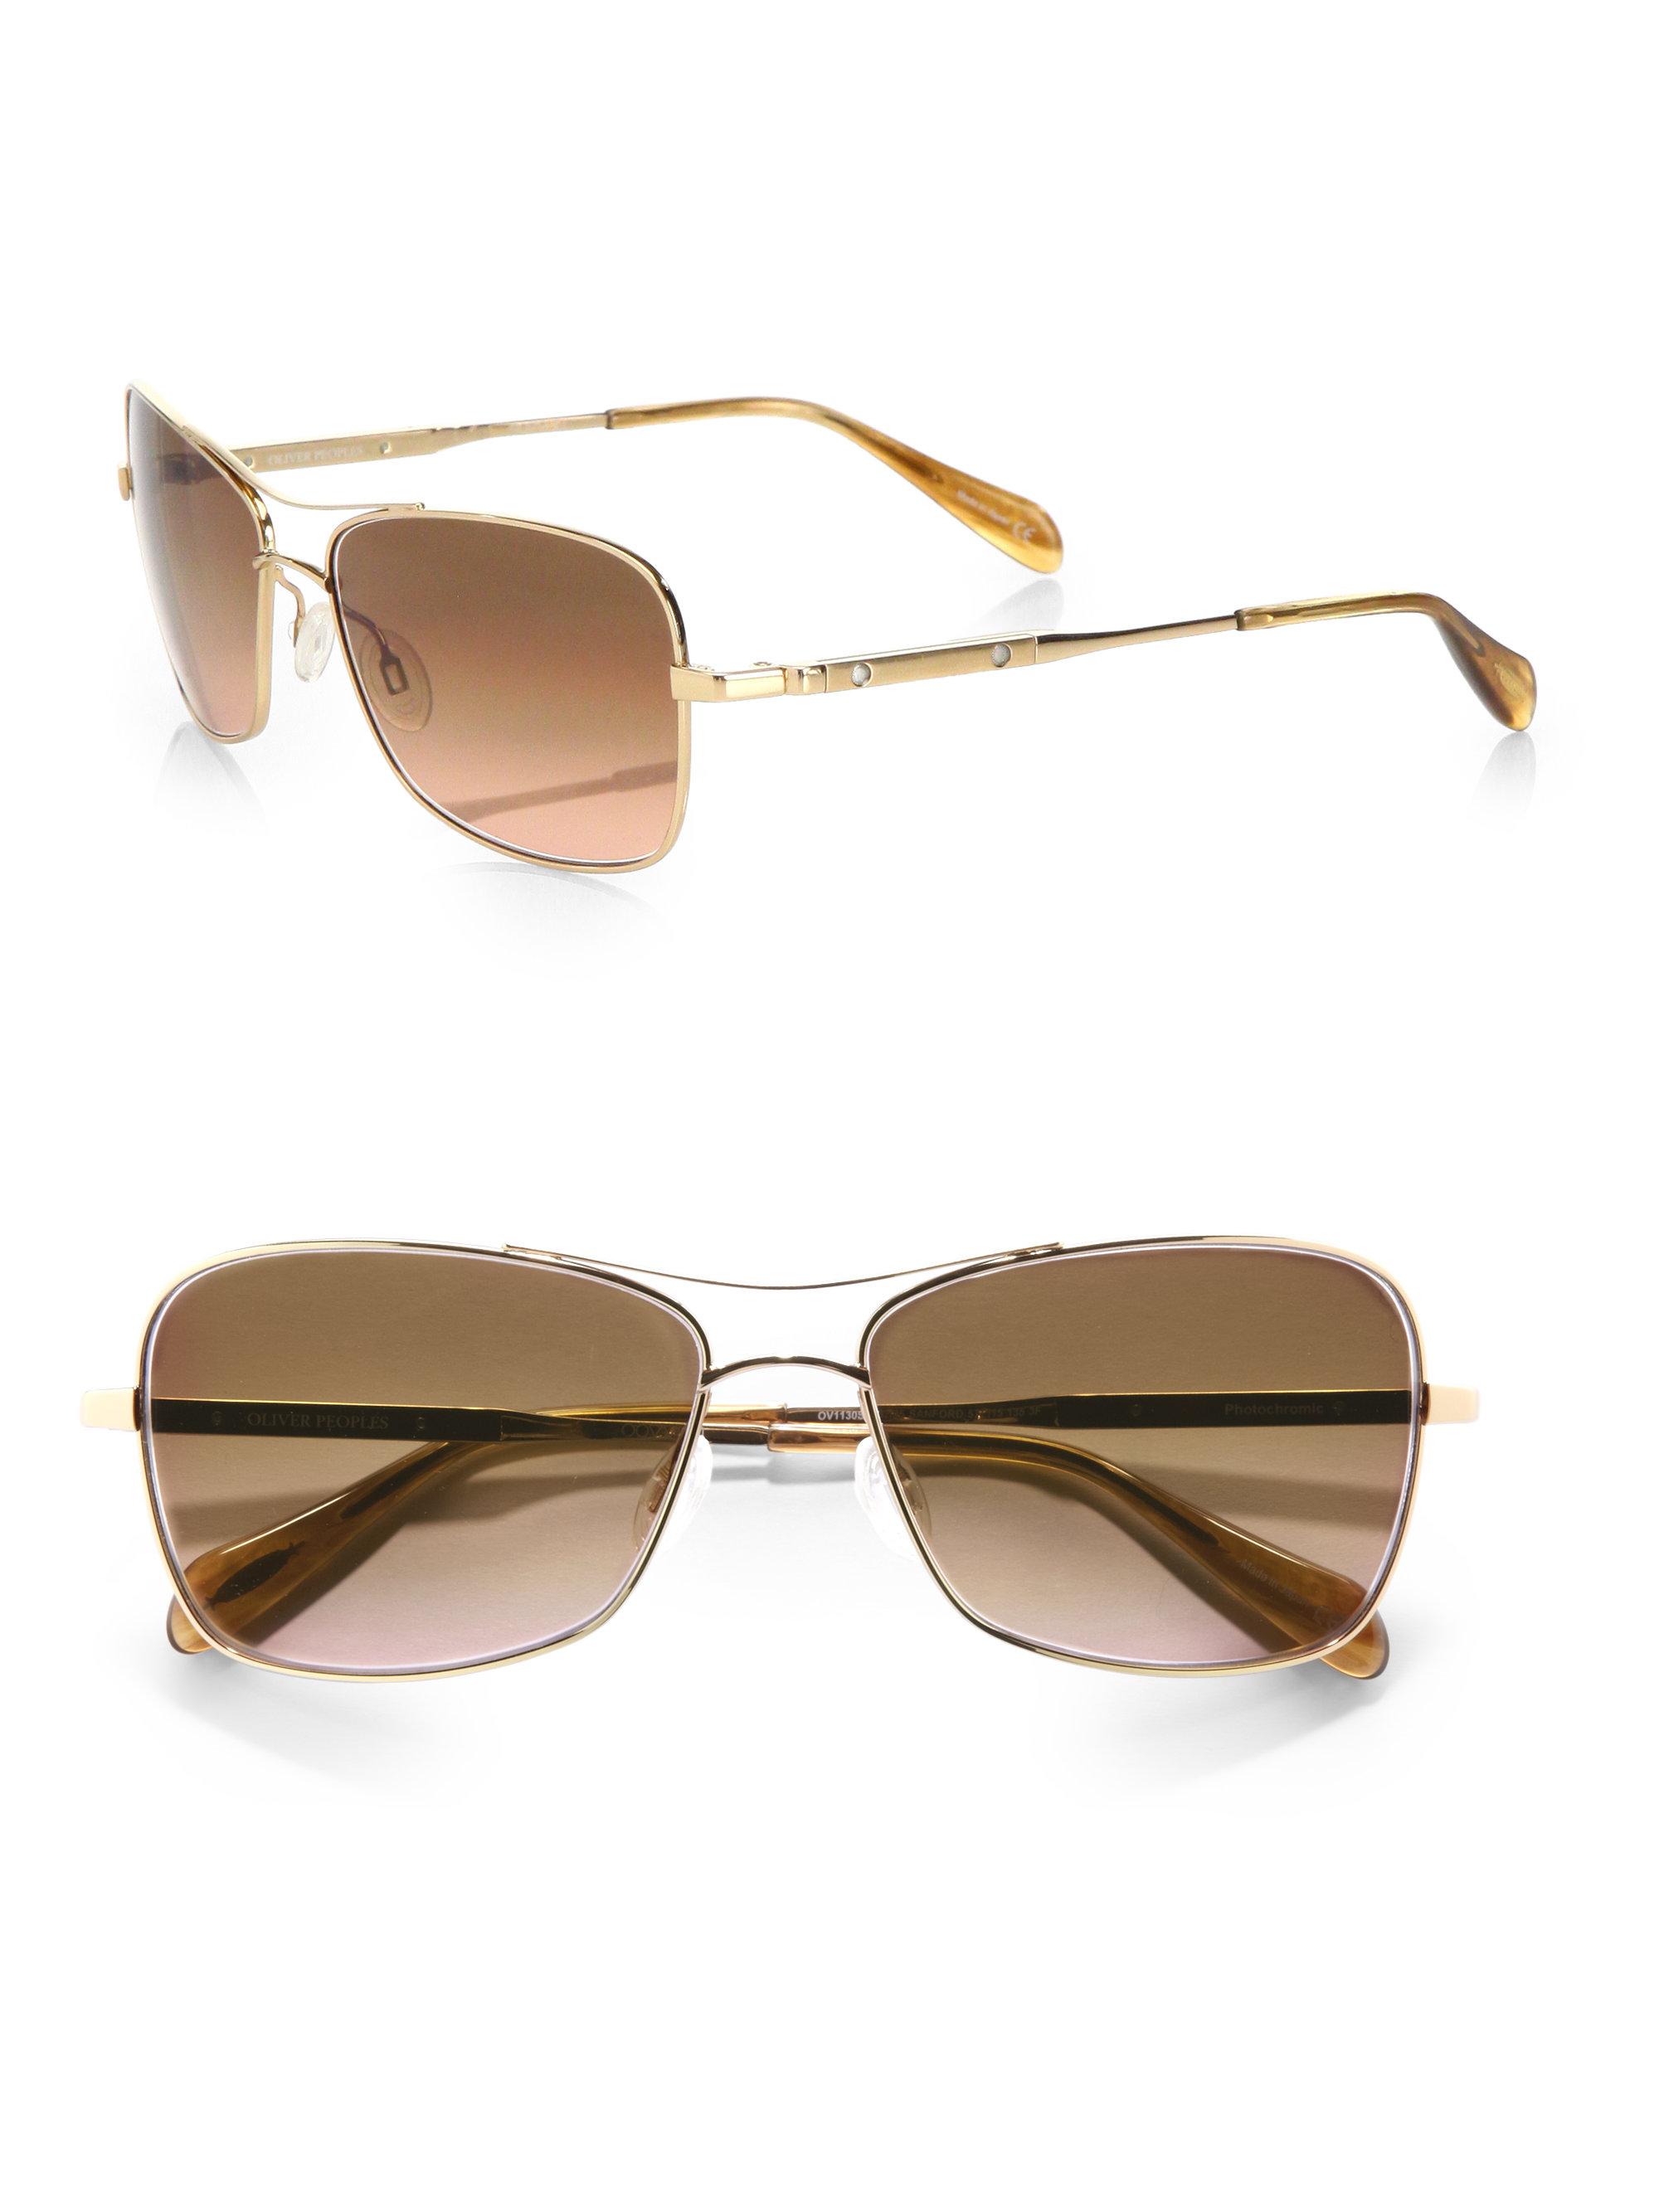 rectangular sunglasses - Metallic Oliver Peoples wsff1Ck4